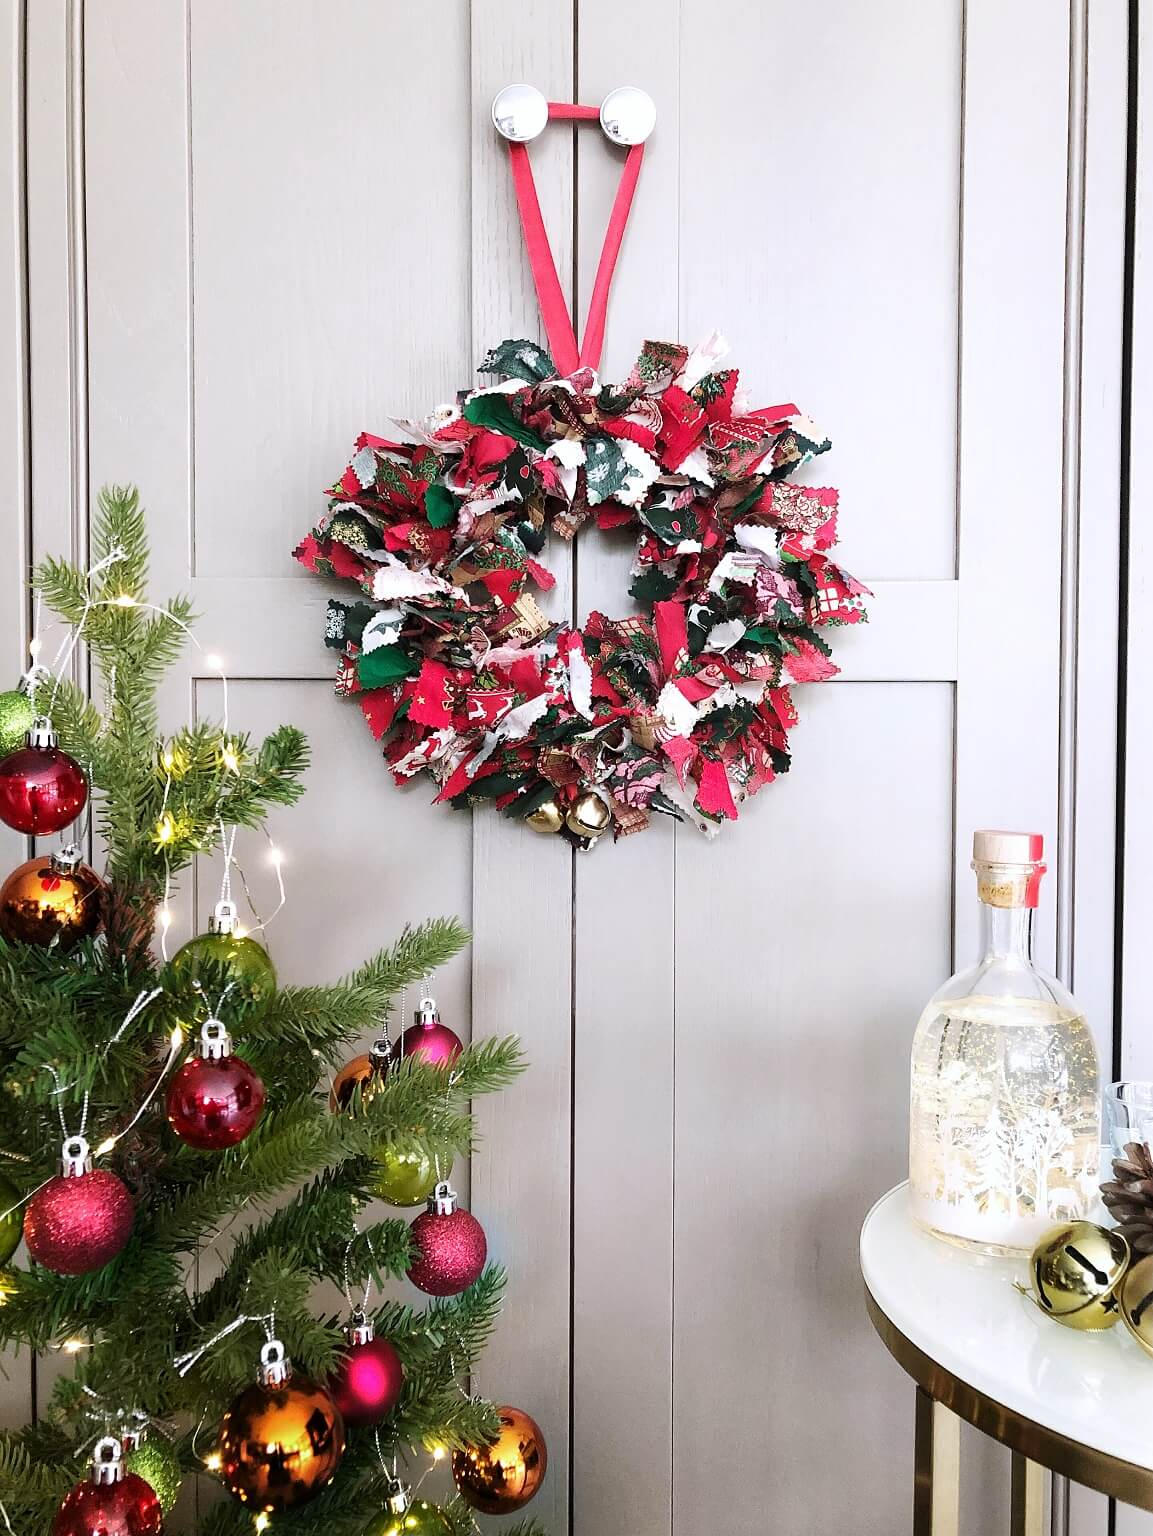 Christmas Rag Wreath With Christmas Tree & Festive Bottle